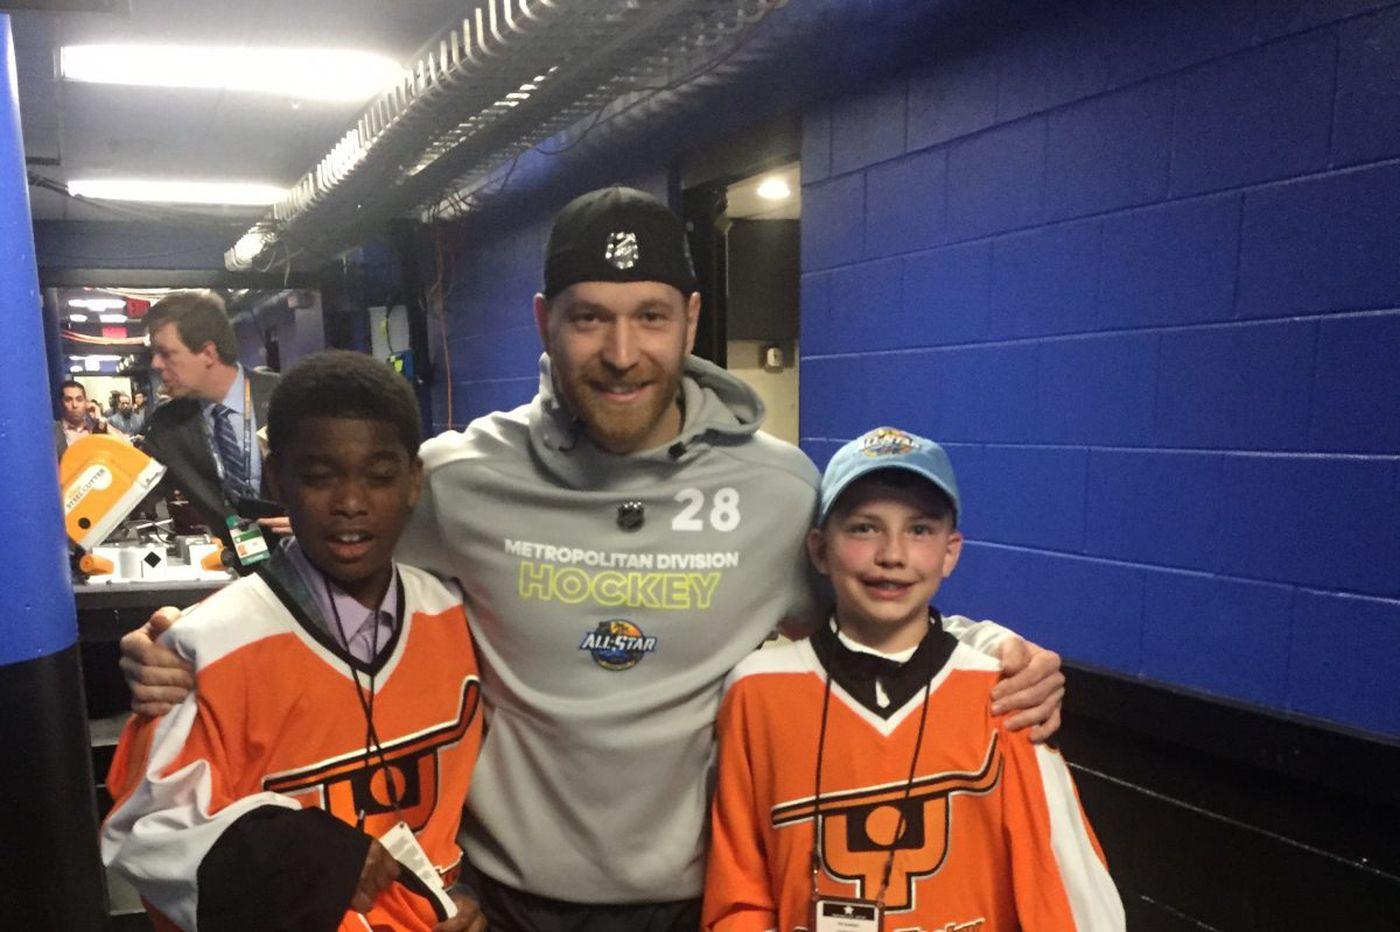 Flyers' Claude Giroux scores, but Metro falls in all-star semifinal